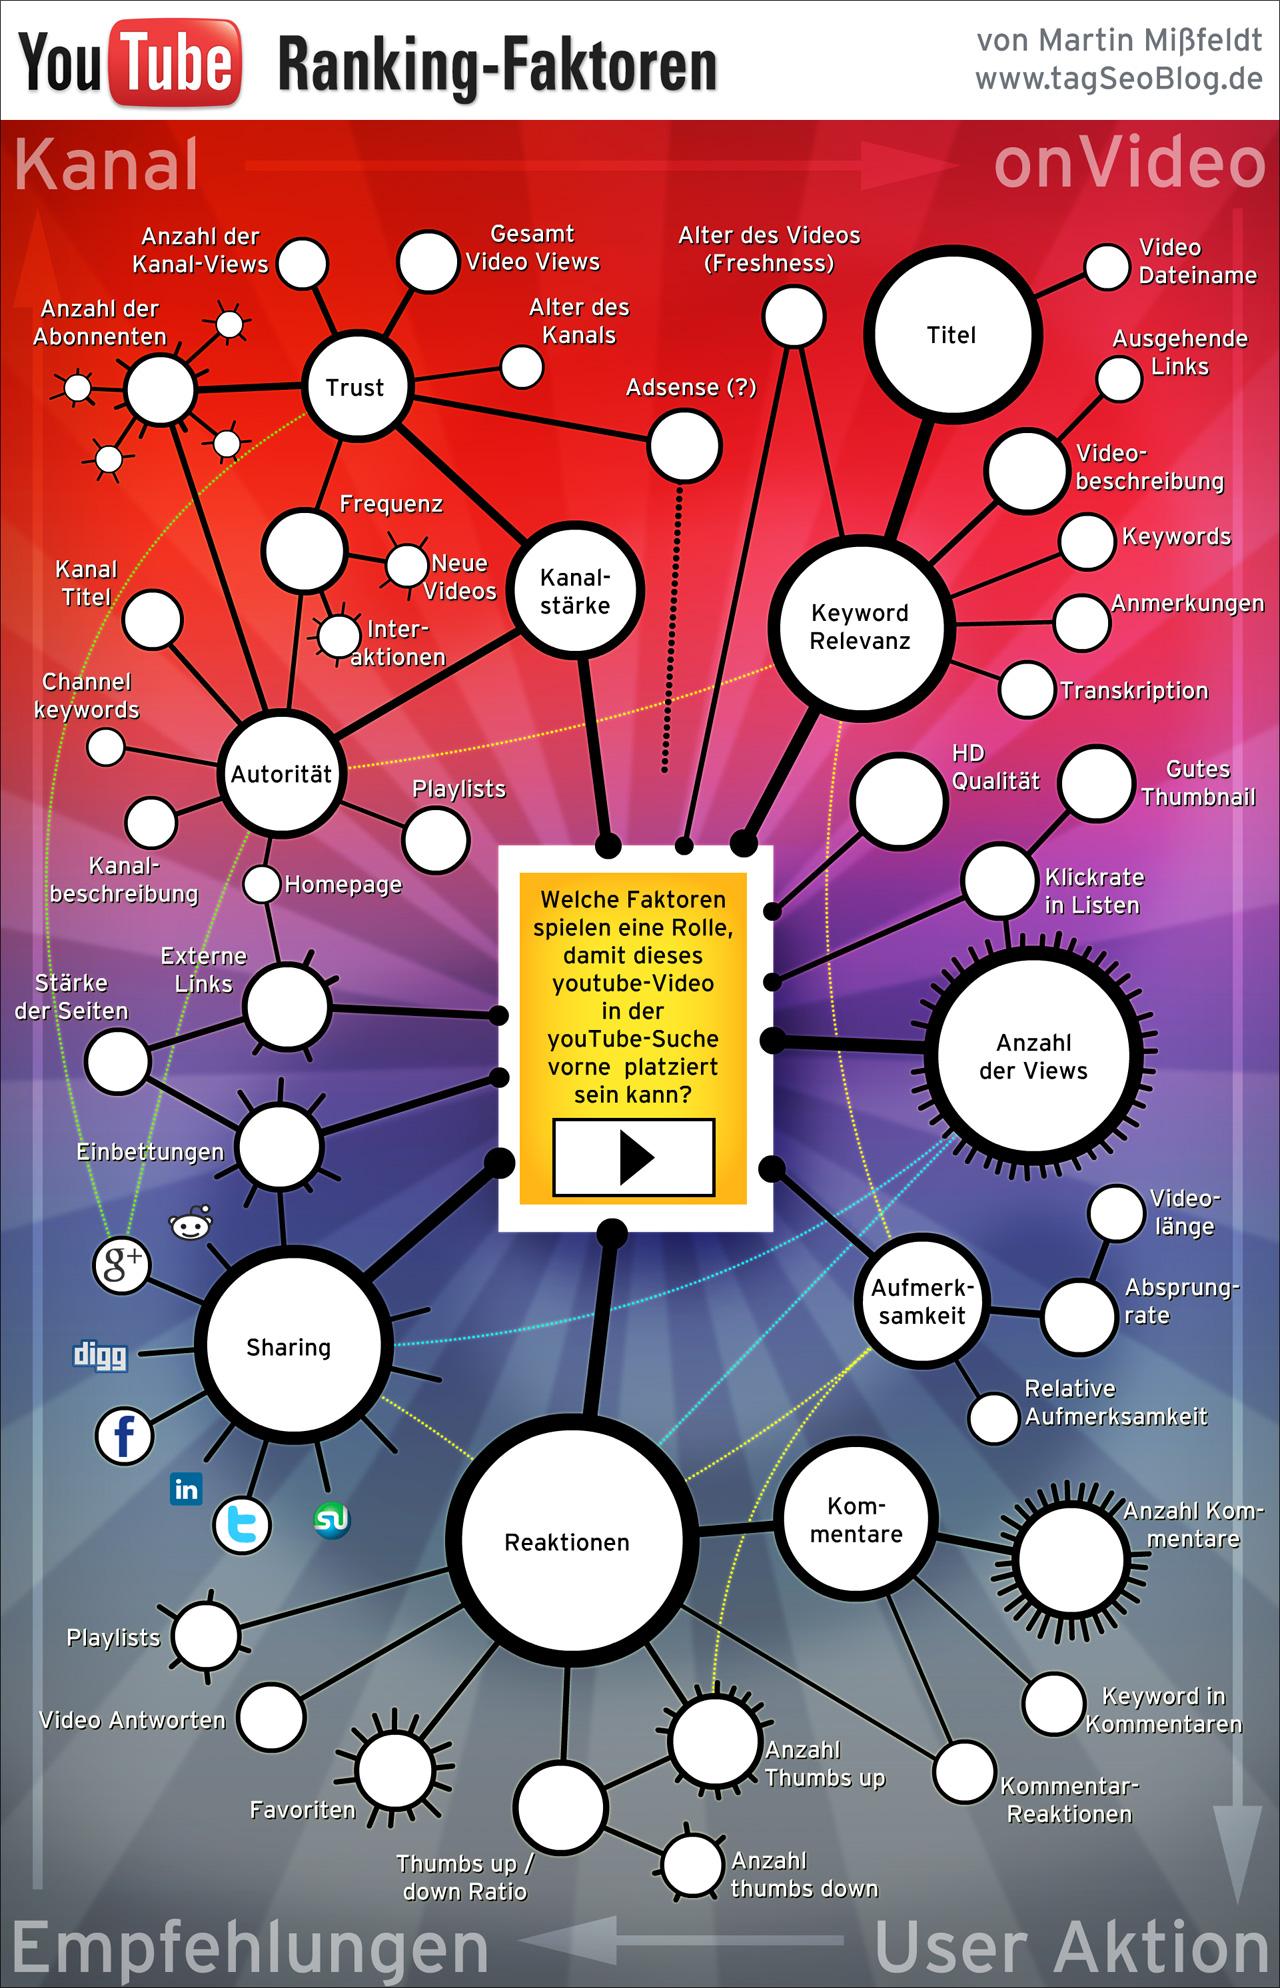 Infografik zu den YouTube-Ranking-Faktoren von Martin Mißfeldt